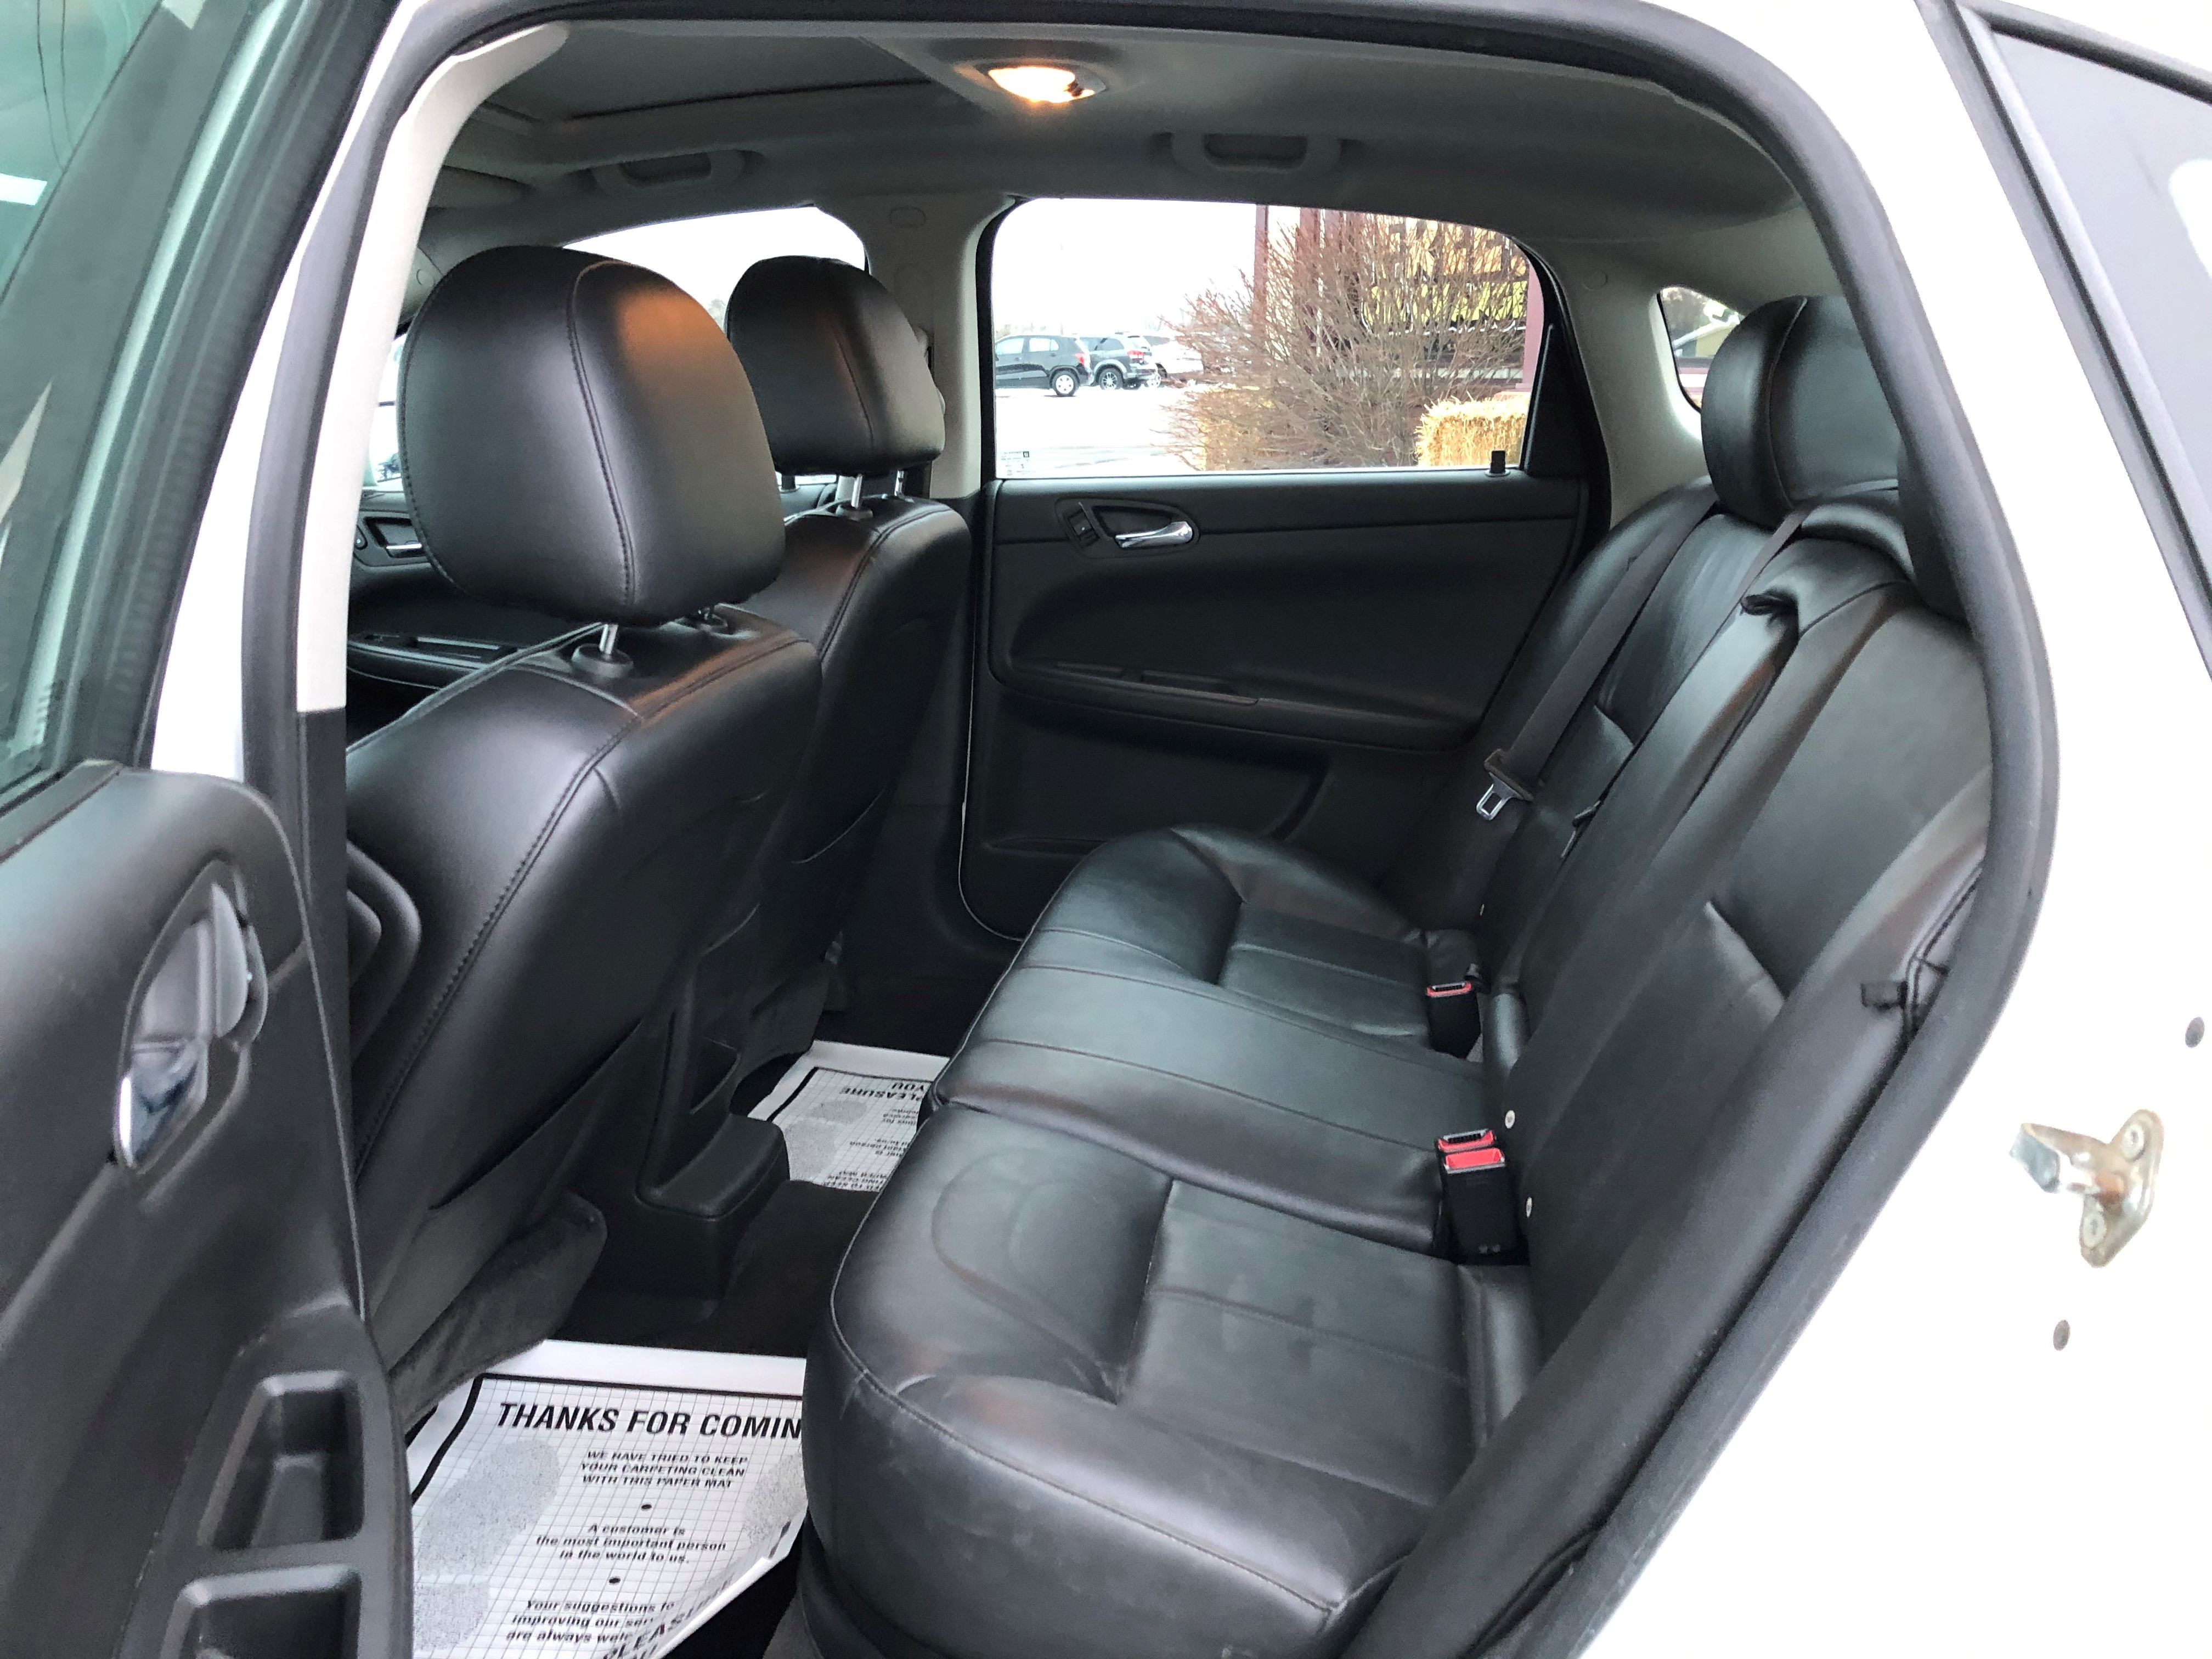 used vehicle - Sedan CHEVROLET IMPALA LIMITED 2015